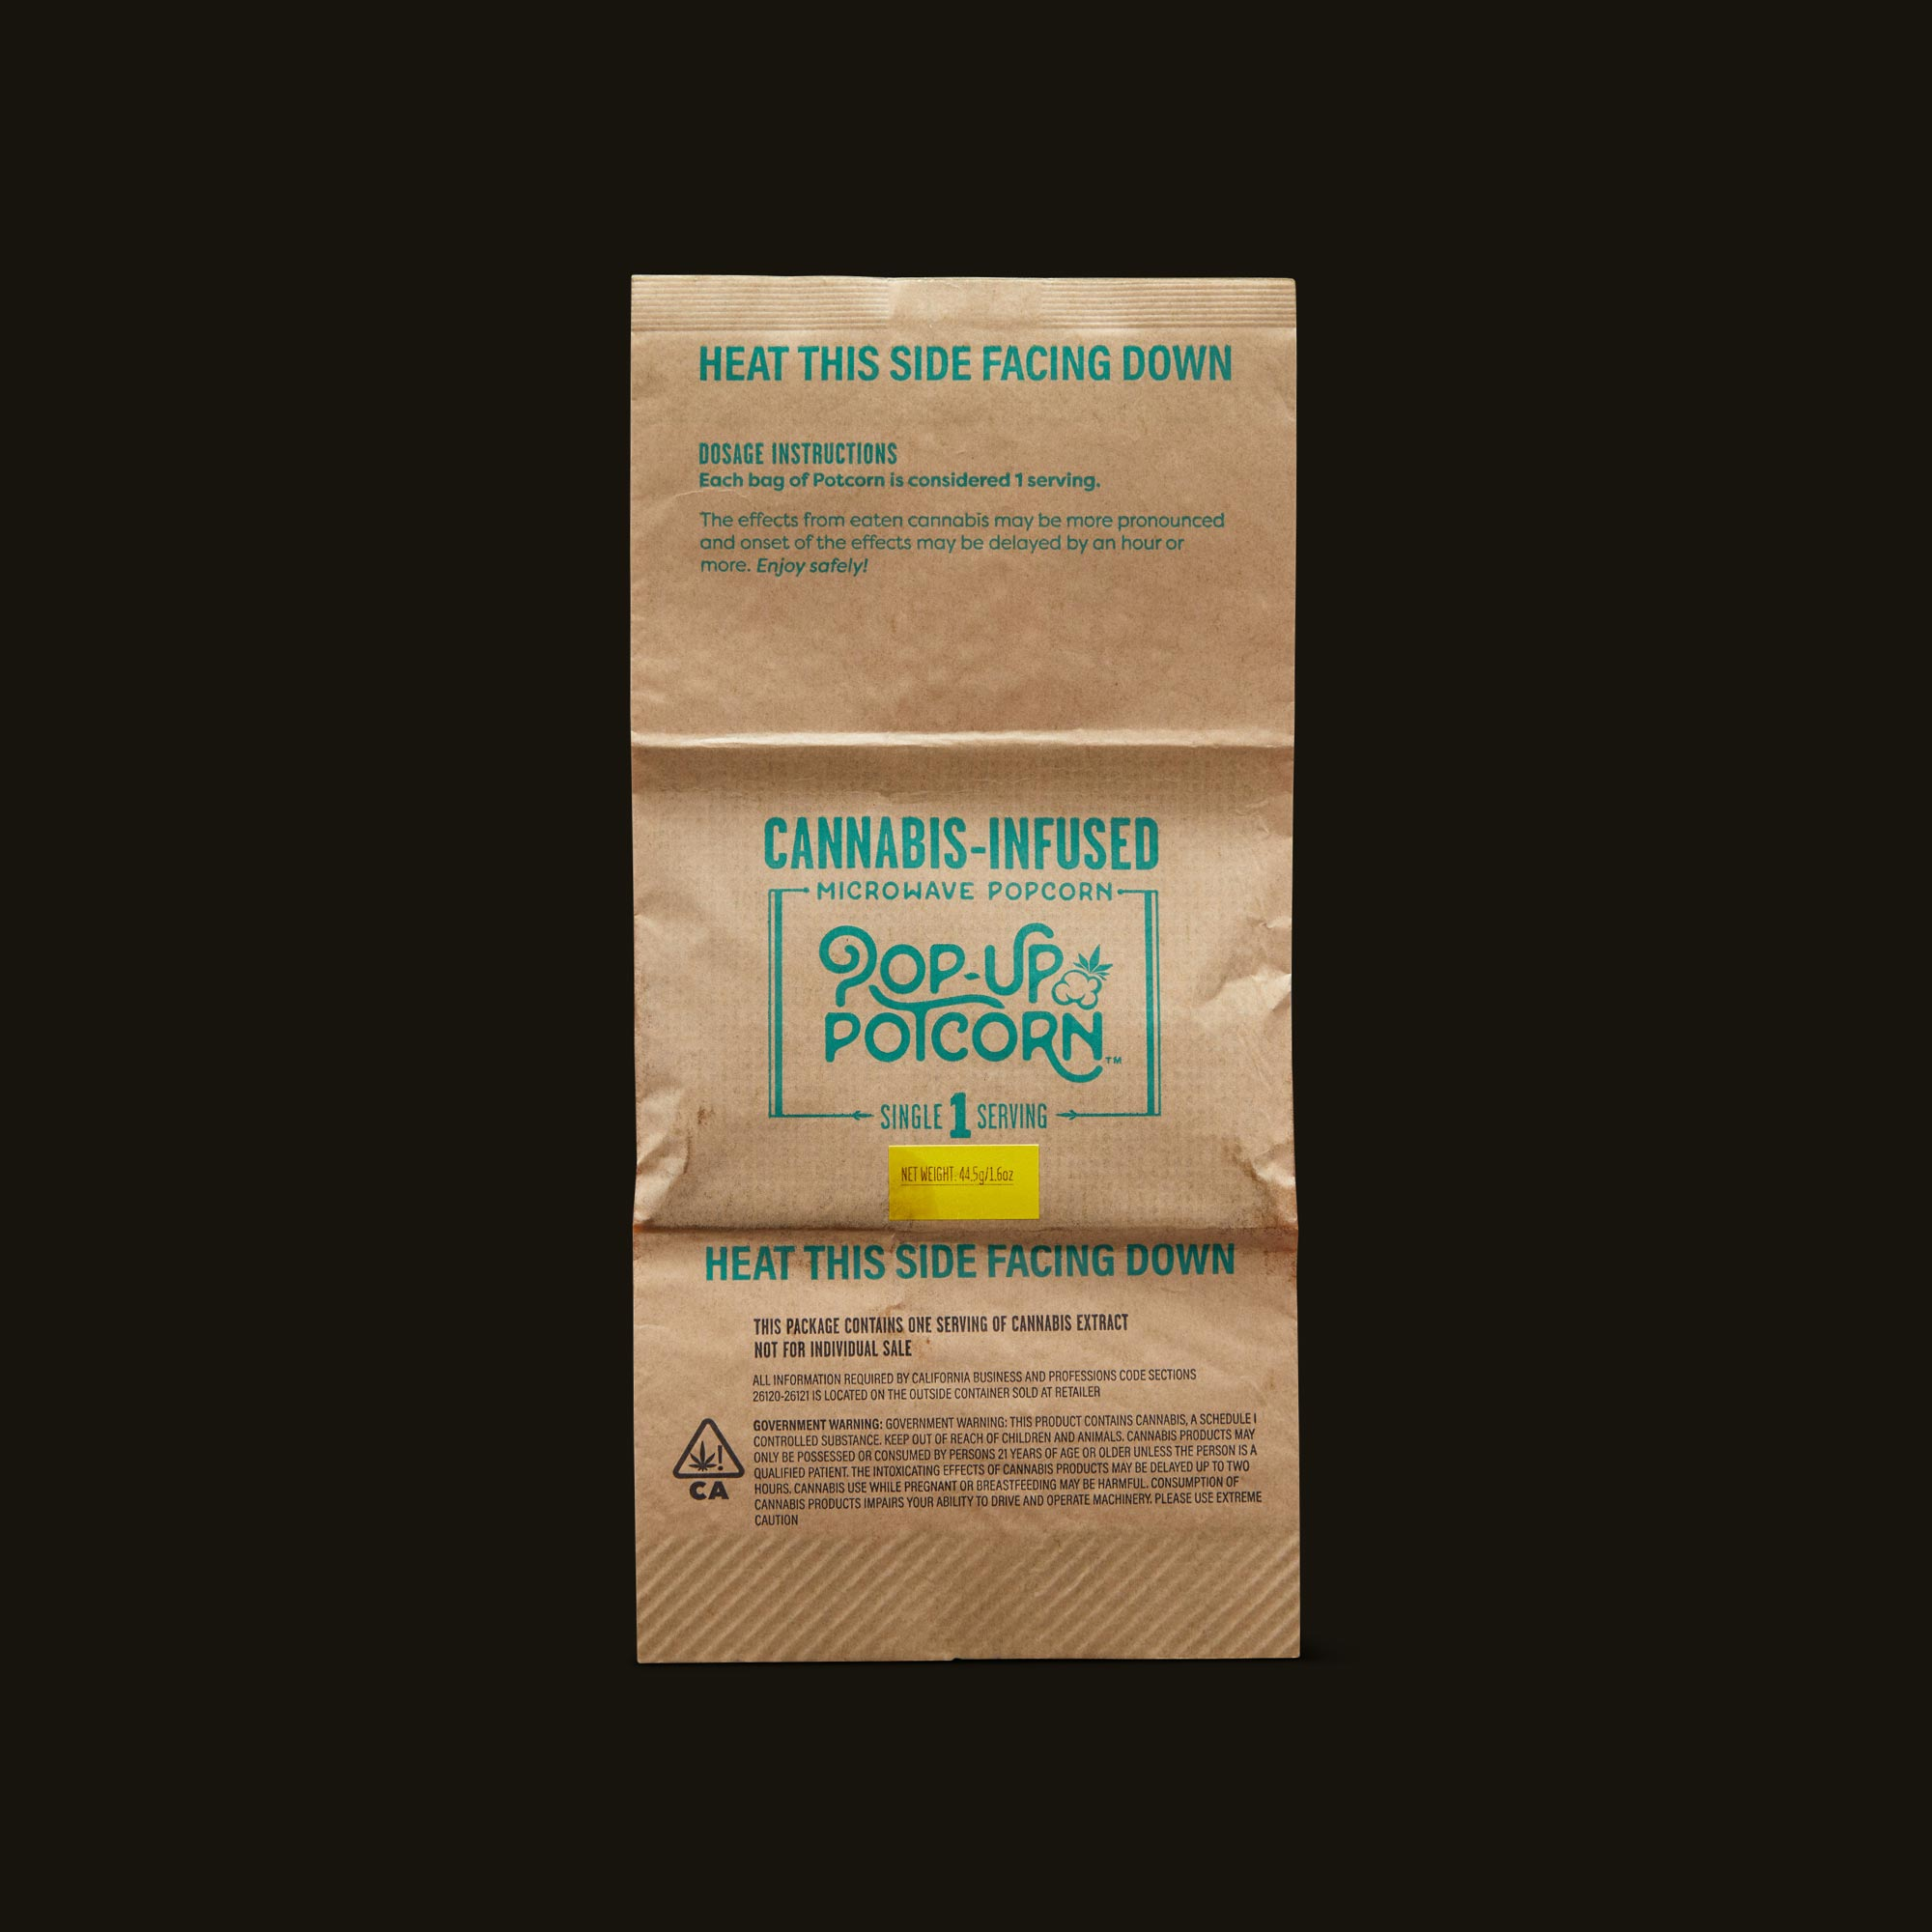 Pop-Up Potcorn Sea Salt Popcorn 10:1 3-Pack Front Inner Packaging